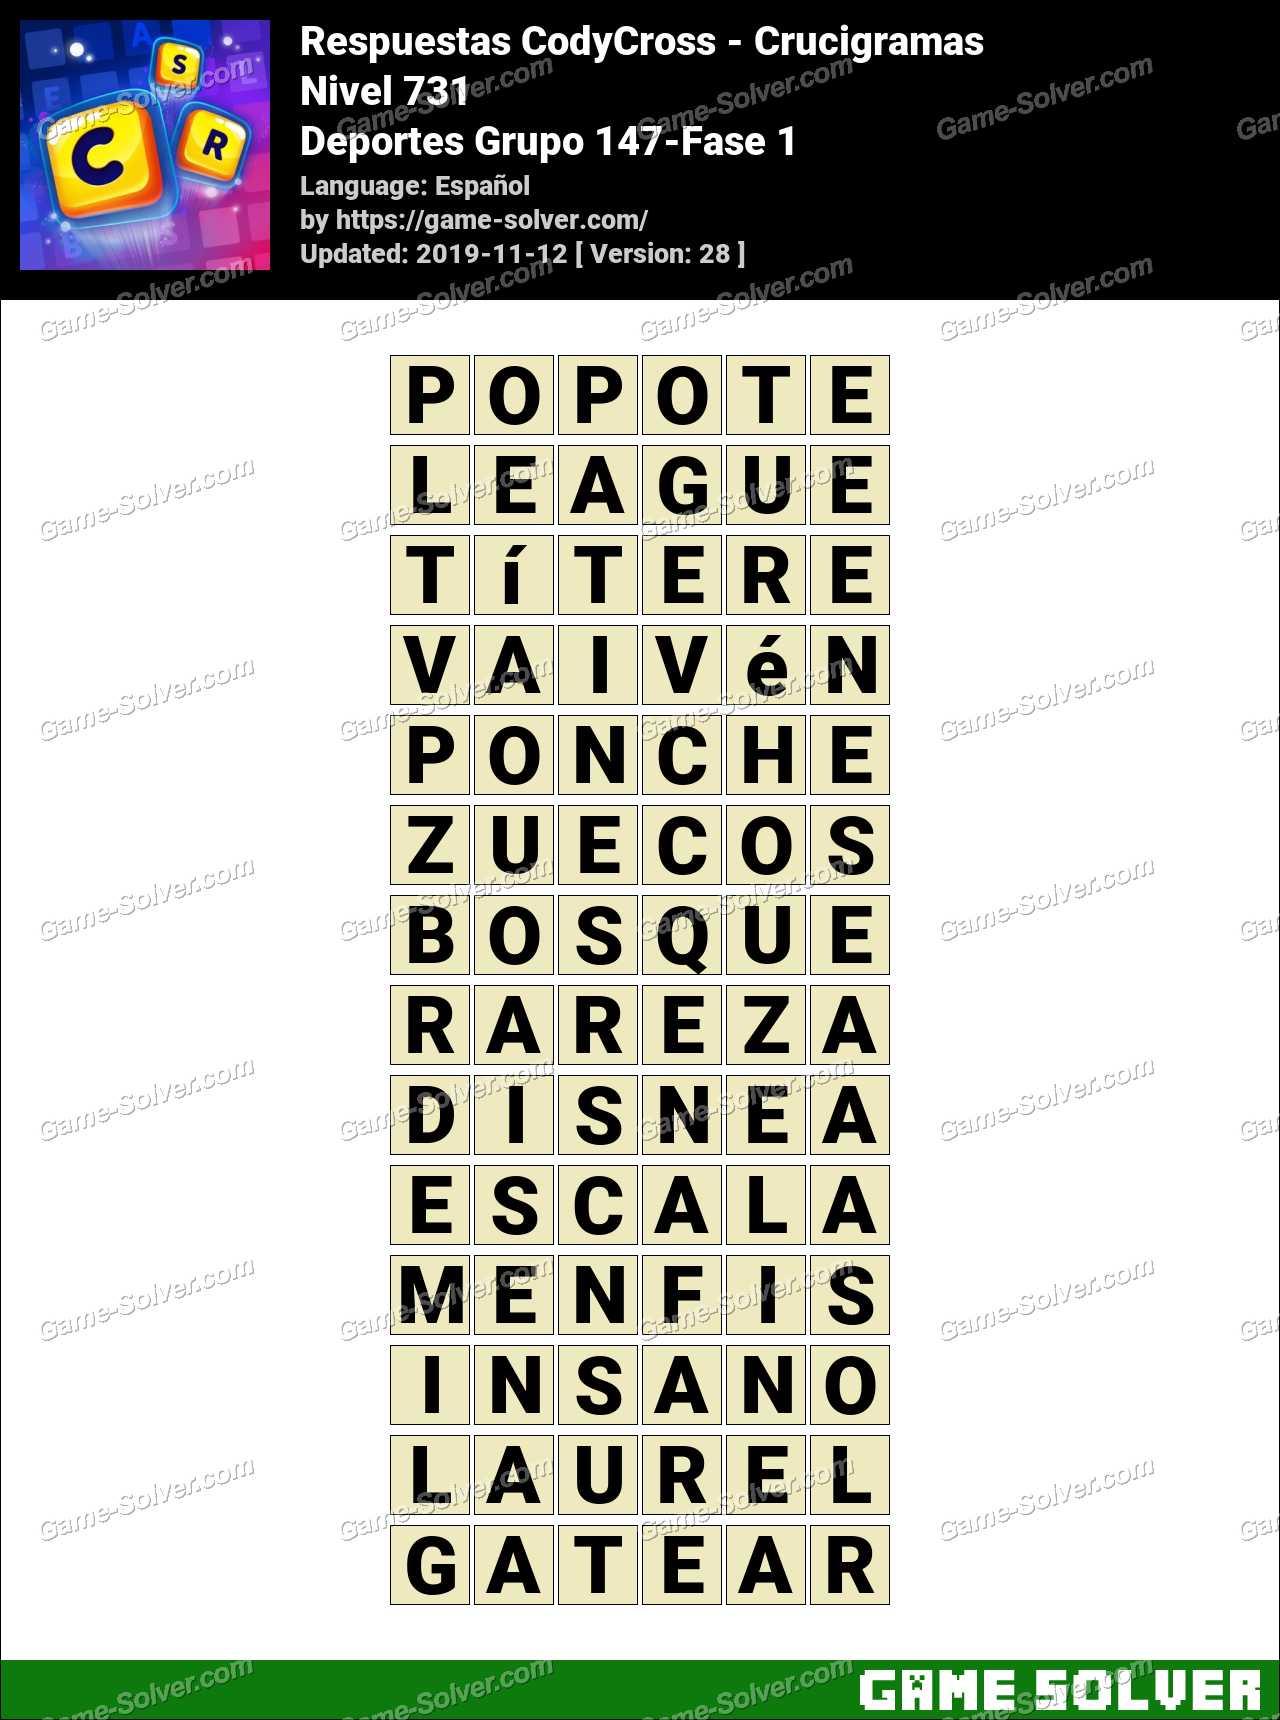 Respuestas CodyCross Deportes Grupo 147-Fase 1